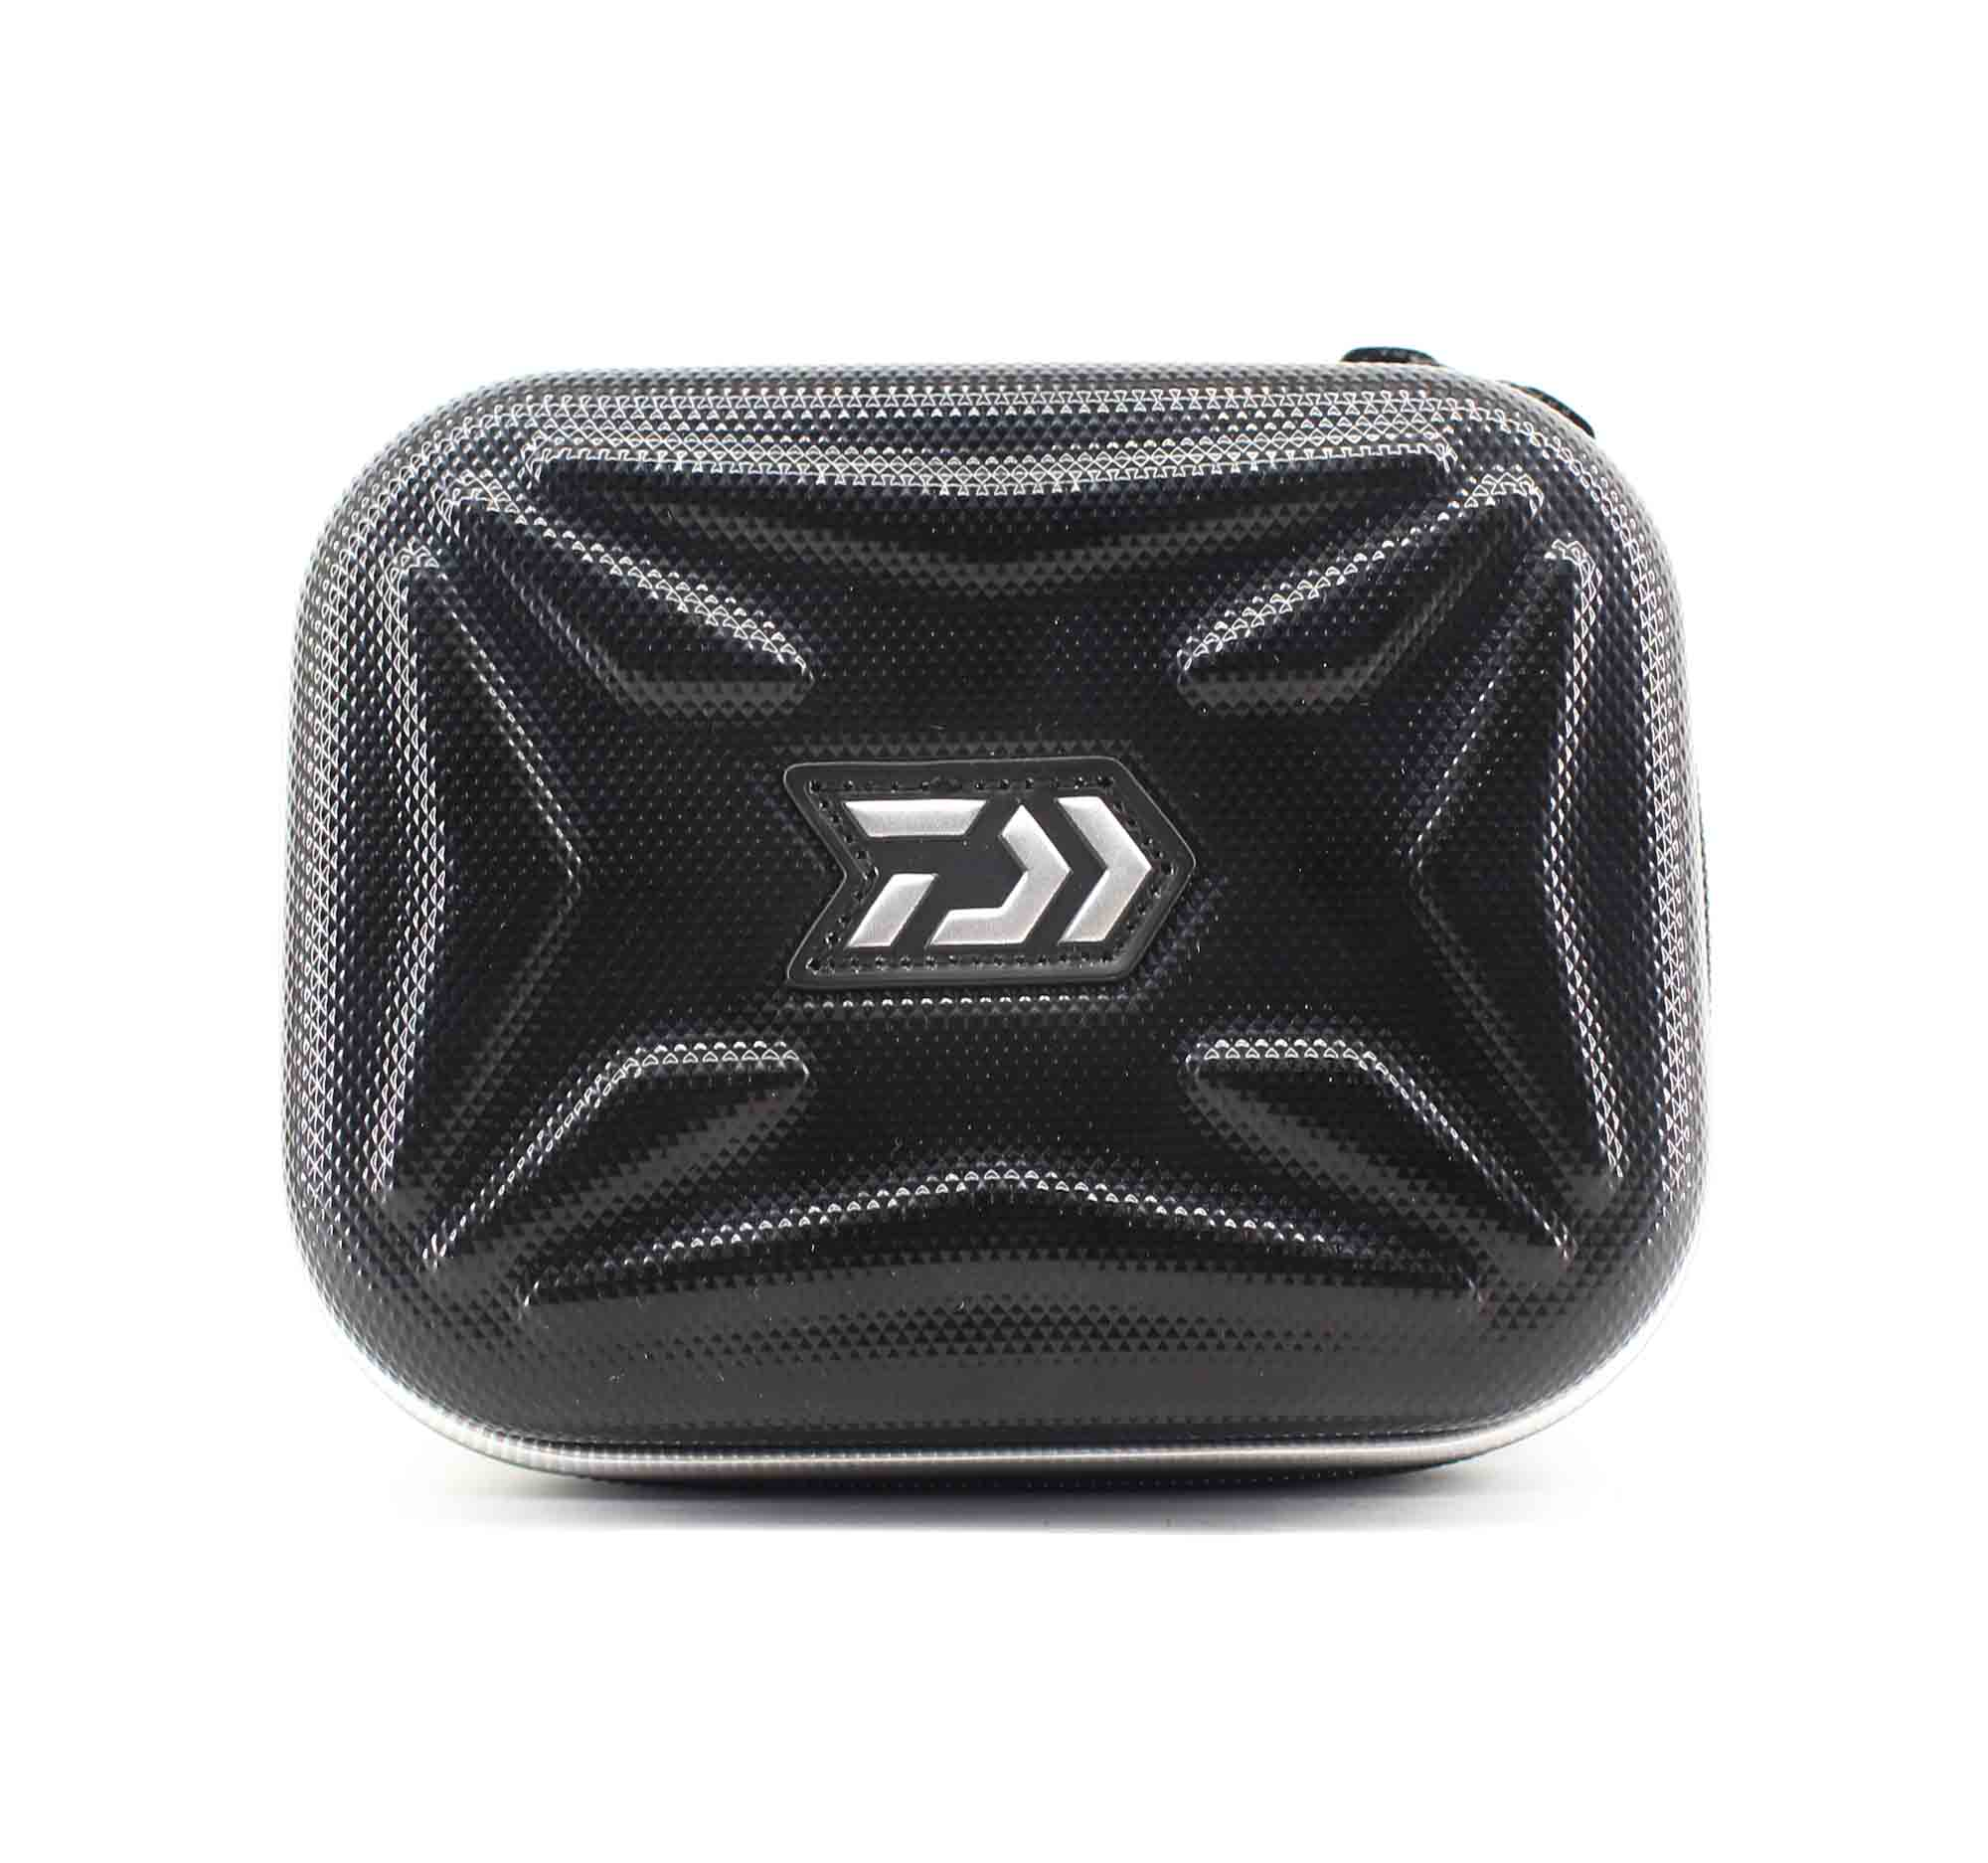 Sale Daiwa Reel Cover HD Case CV-S for 1000-1500 Reels (0532)